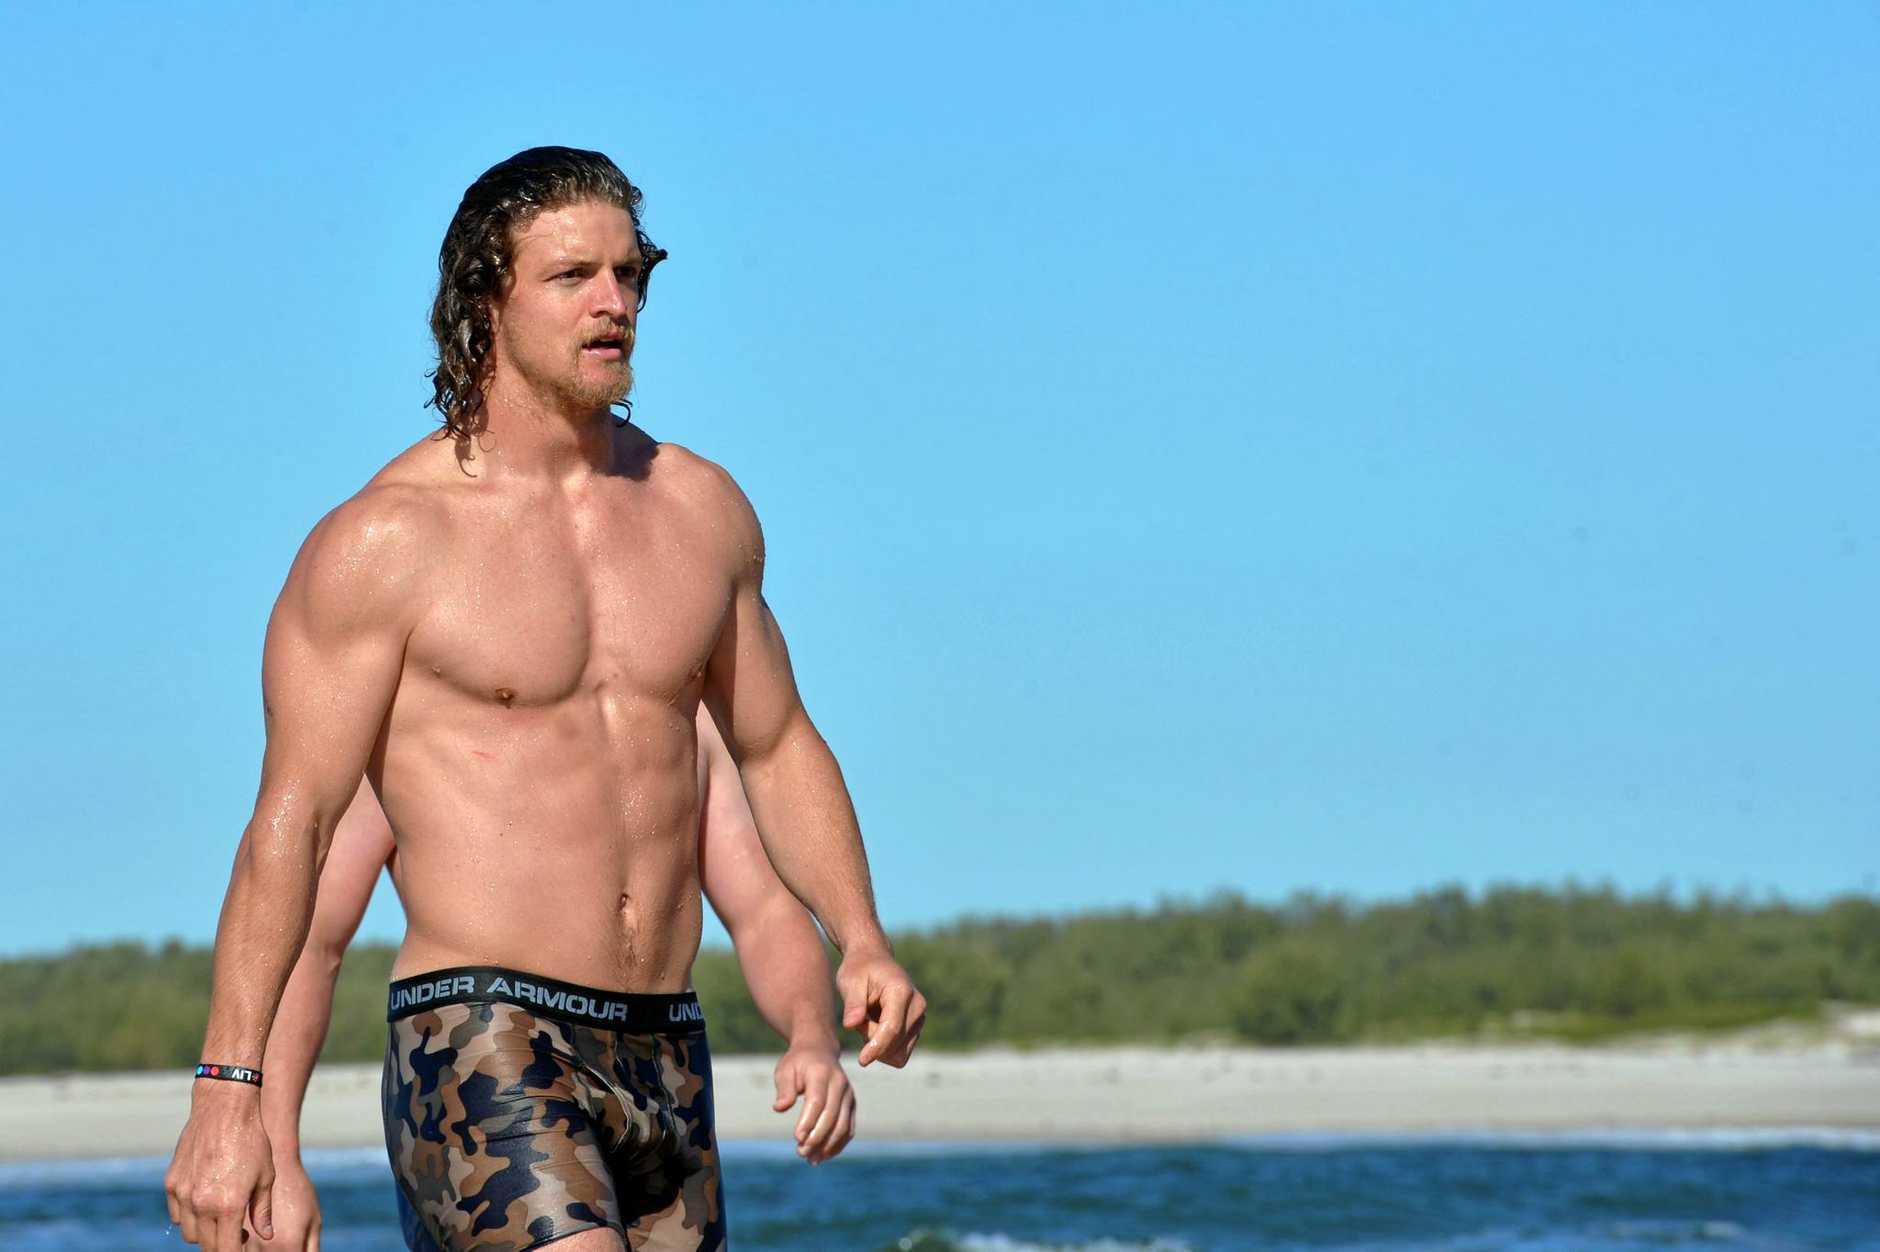 The Wallabies take a swim at Caloundra. Nick Cummins, The Honey Badger.   Photo: John McCutcheon / Sunshine Coast Daily